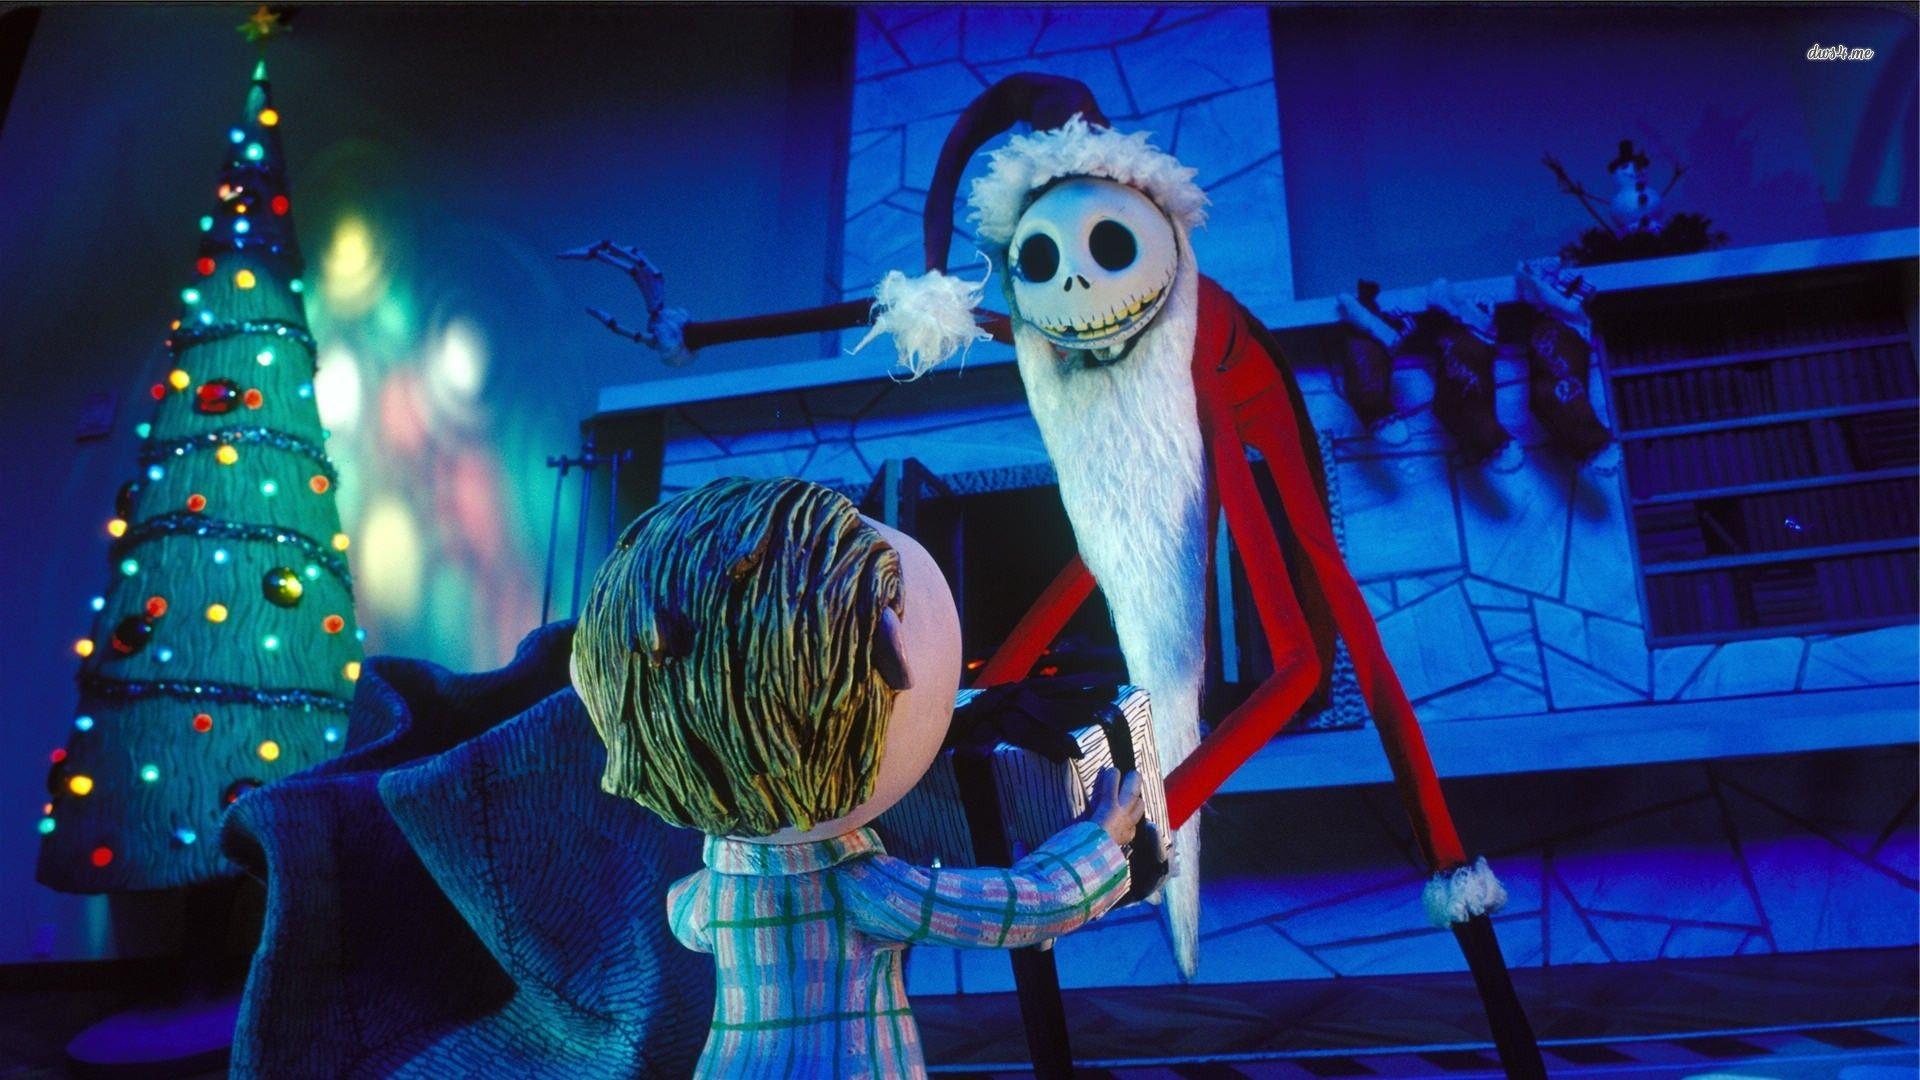 Walldime Com Nightmare Before Christmas Halloween Nightmare Before Christmas Wallpaper Nightmare Before Christmas